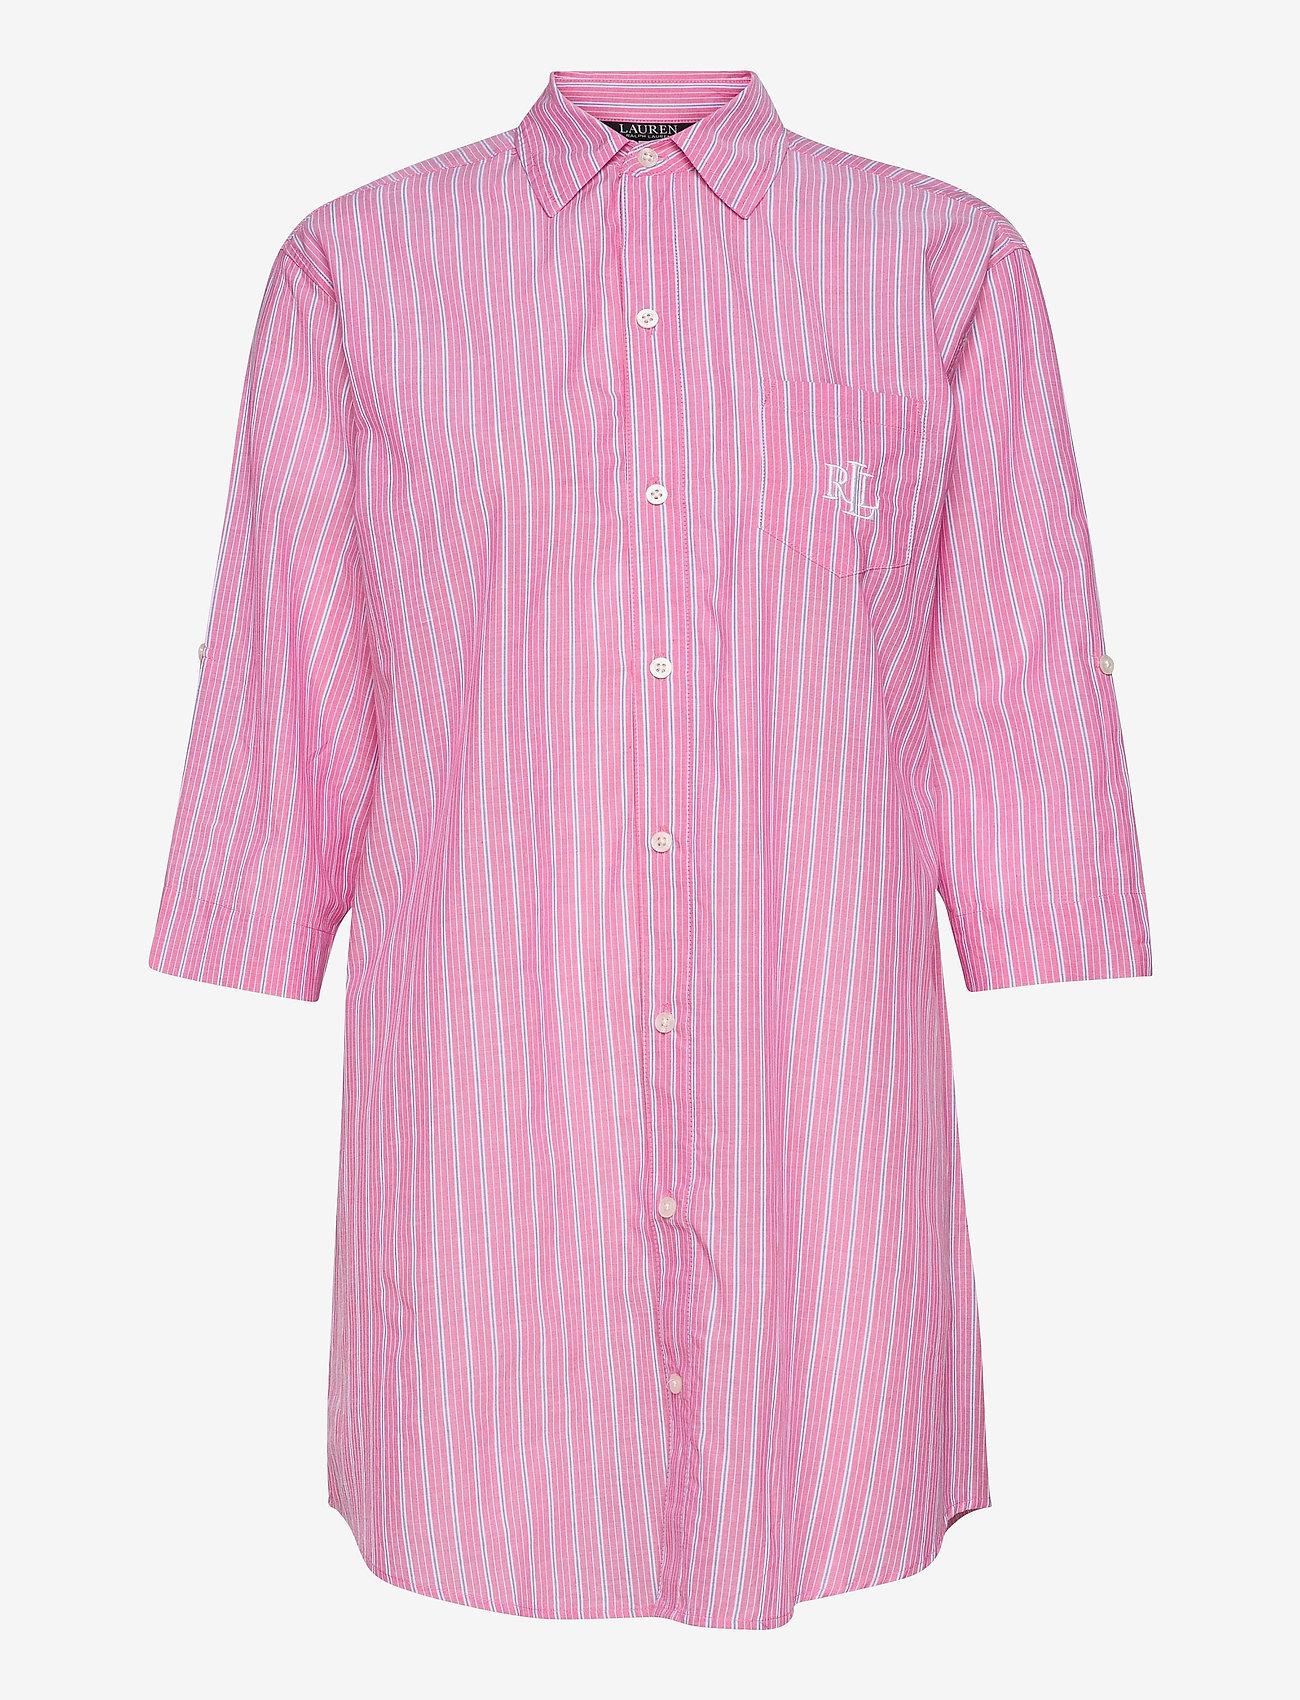 Lauren Ralph Lauren Homewear - LRL ROLL TAB HIS SLEEPSHIRT - natkjoler - pink stripe - 0